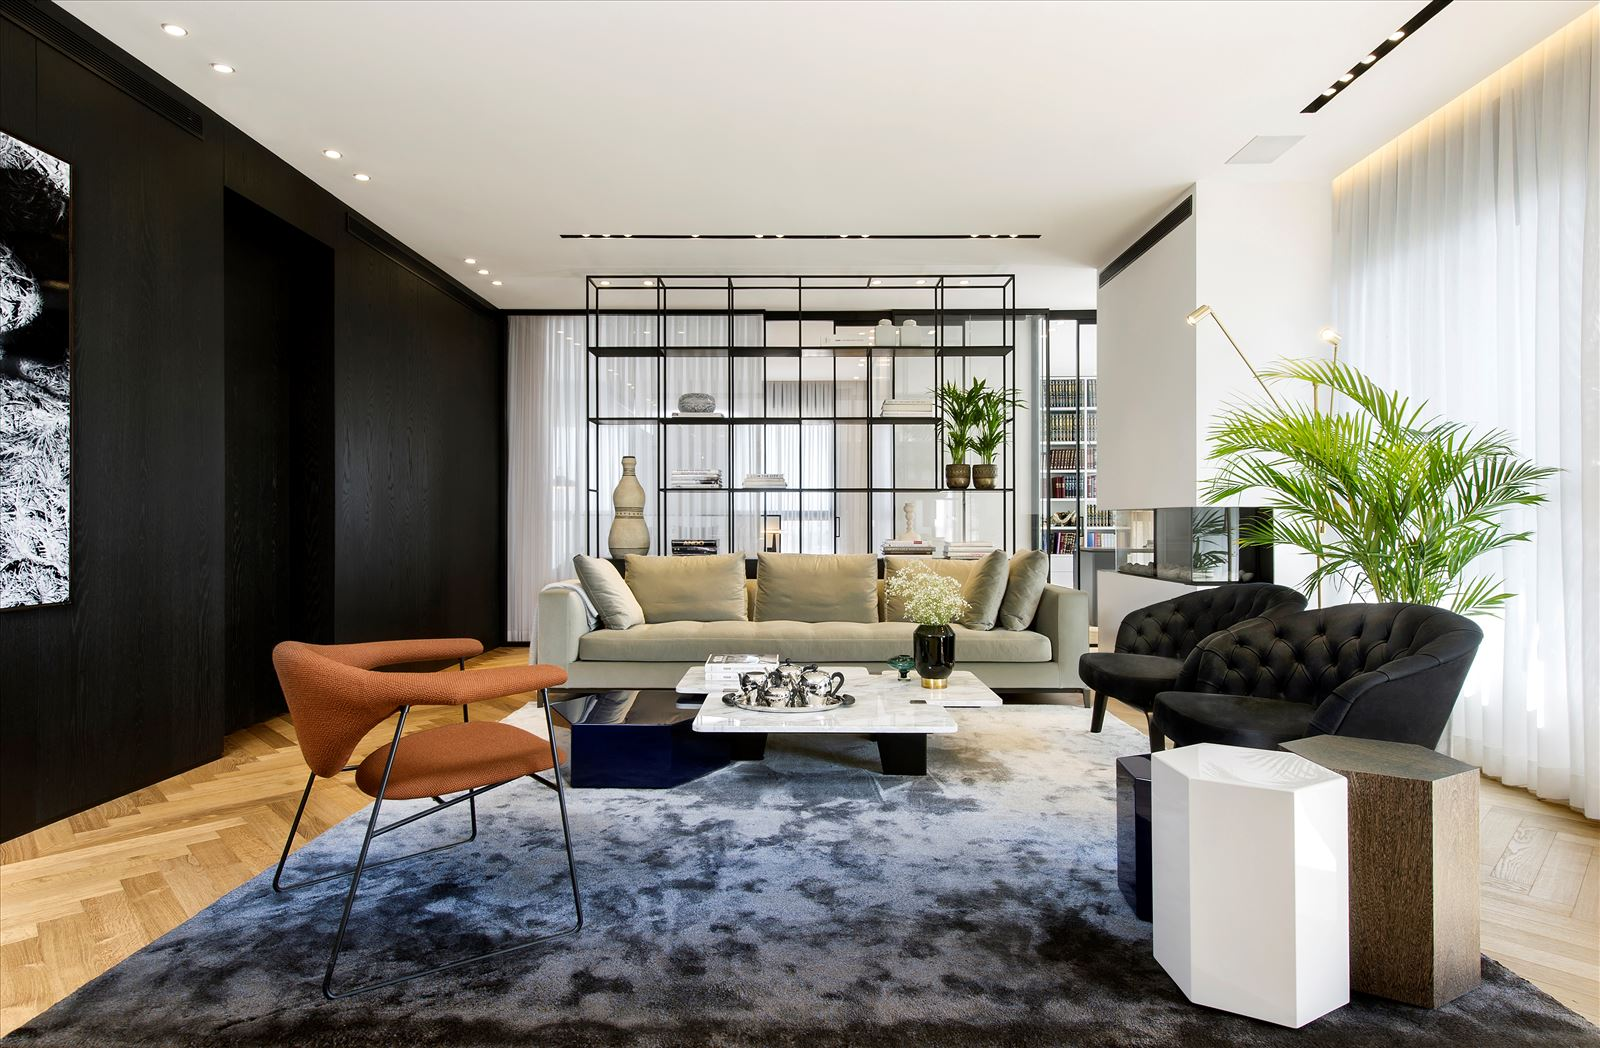 Penthouse - Petah Tikva חלל הסלון מואר במגוון גופי תאורה בעיצוב של דורי קמחי